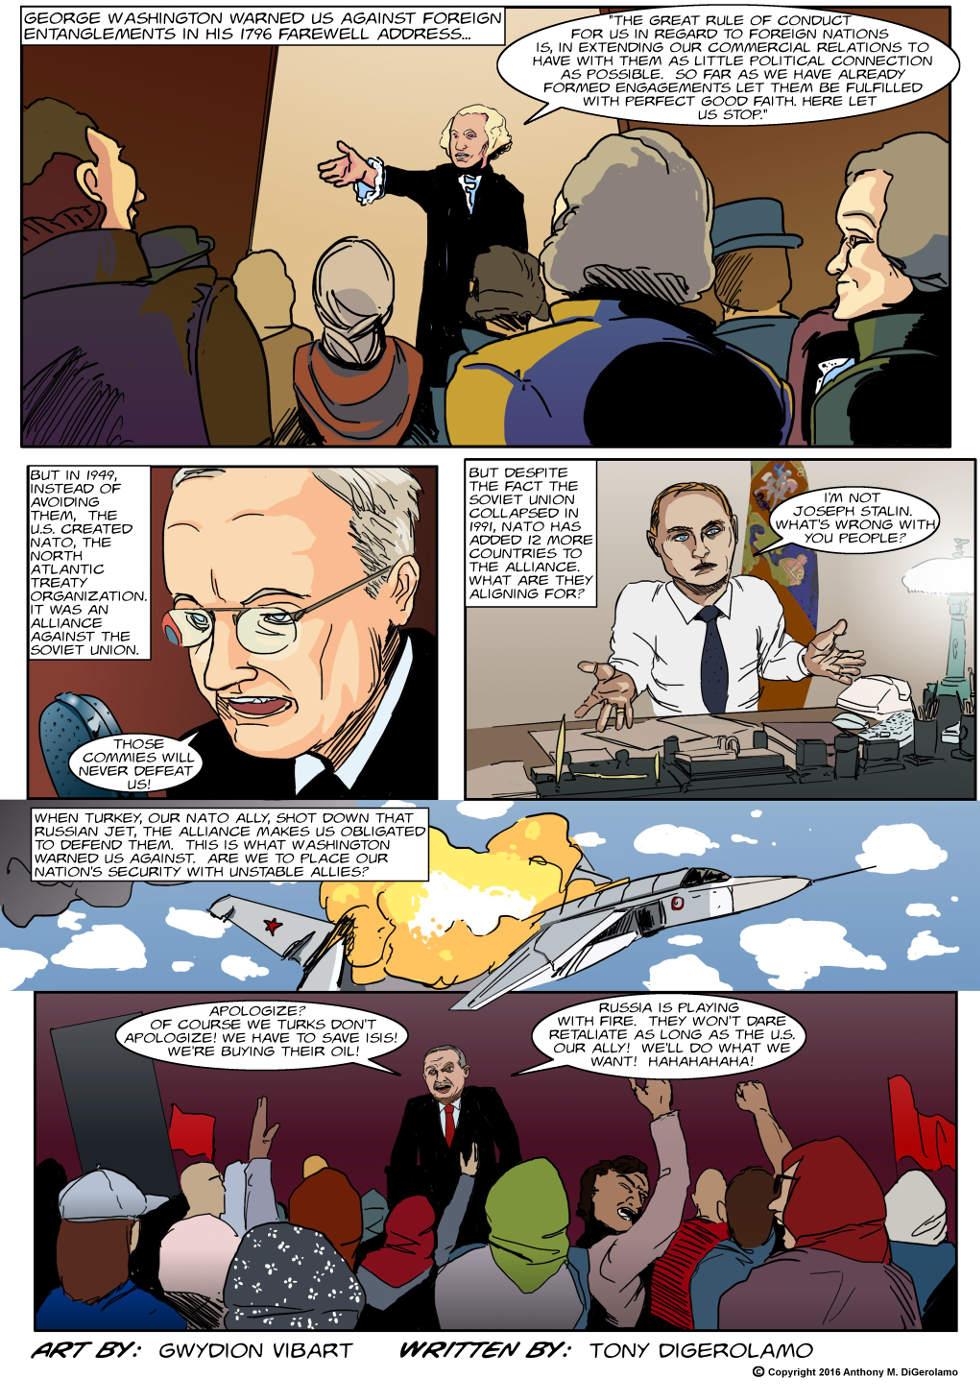 The Antiwar Comic:  Entangling Alliances